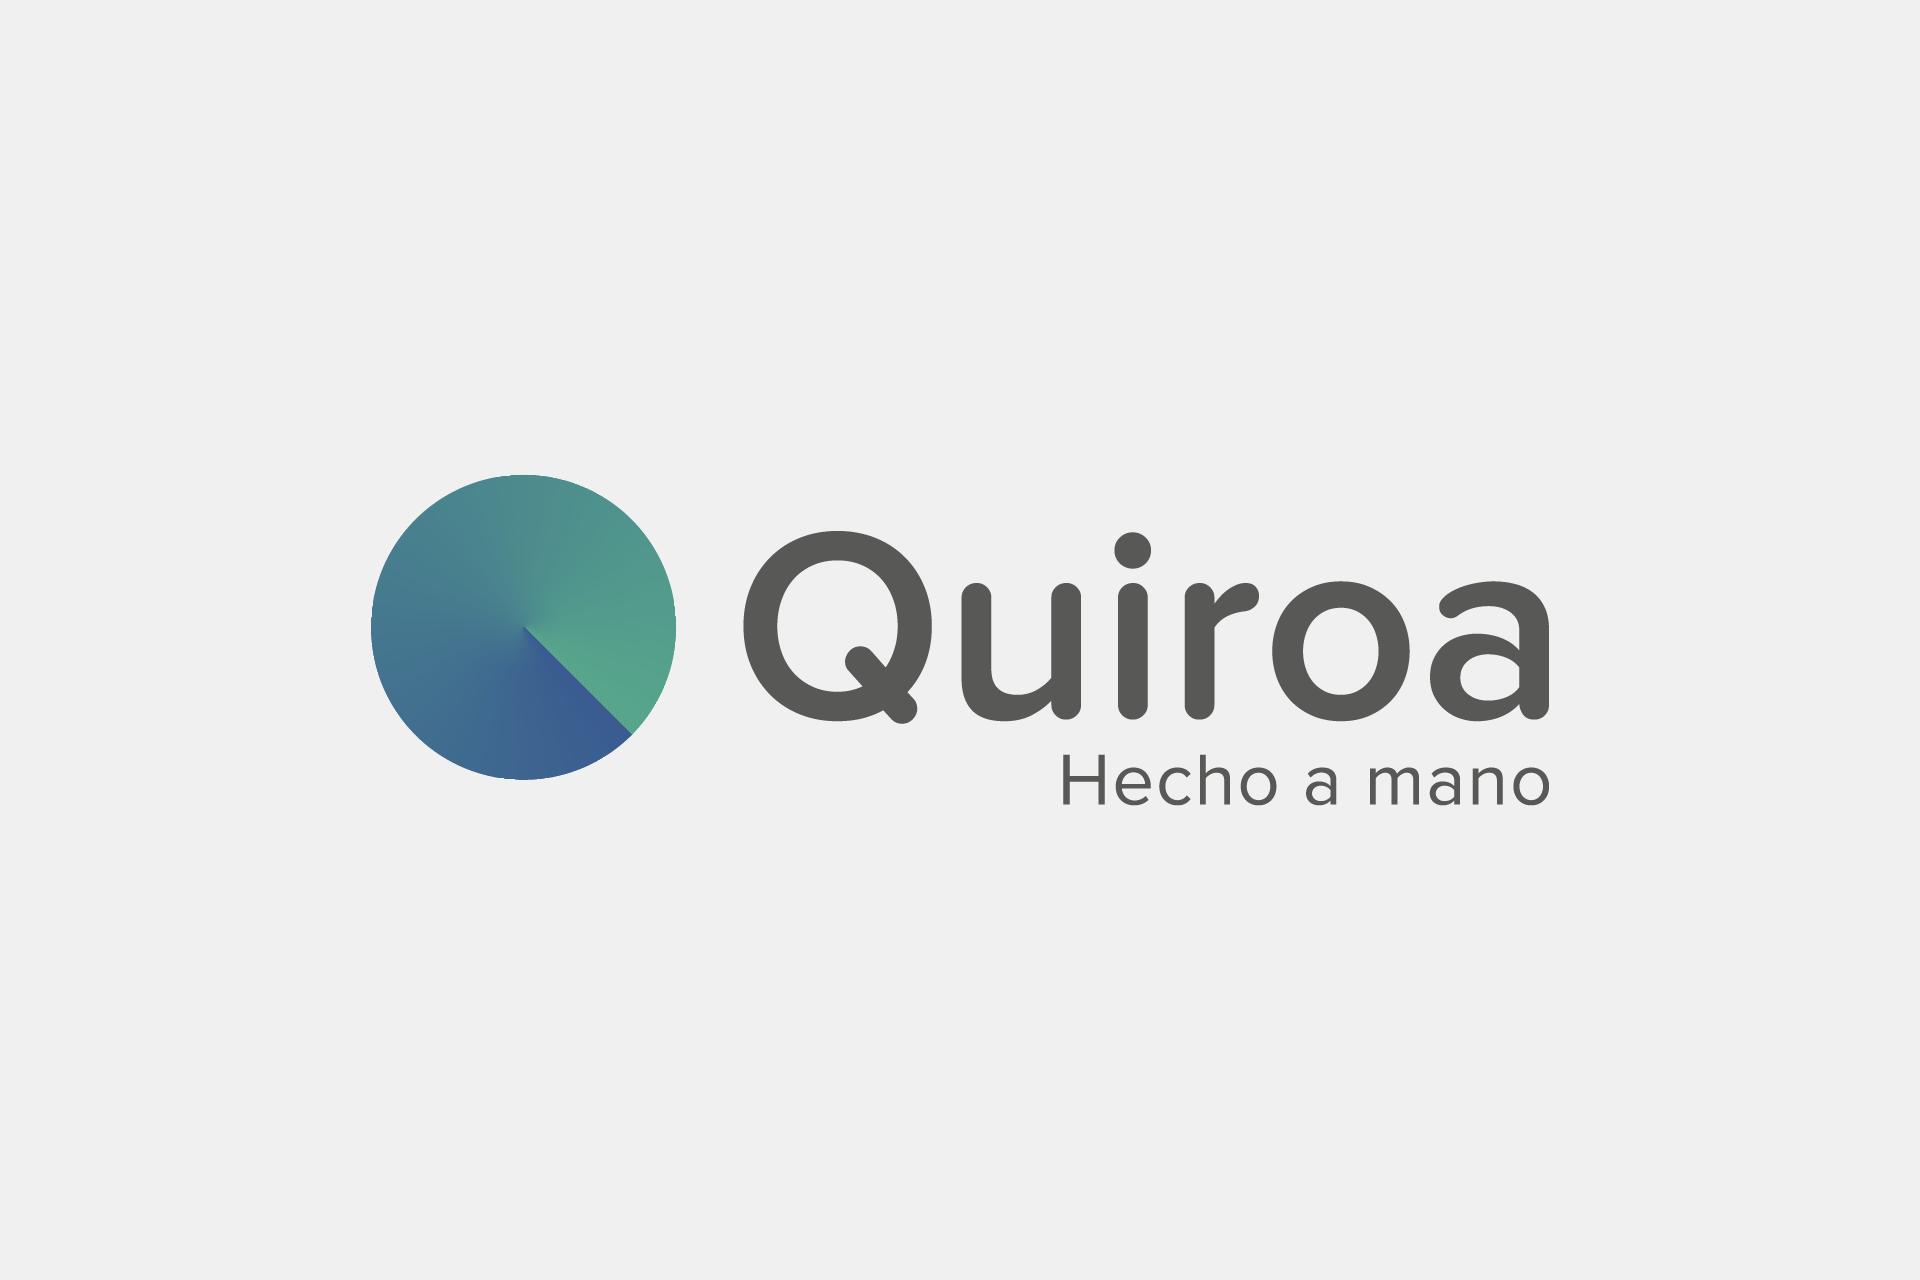 Identidad corporativa Quiroa - Socioººº